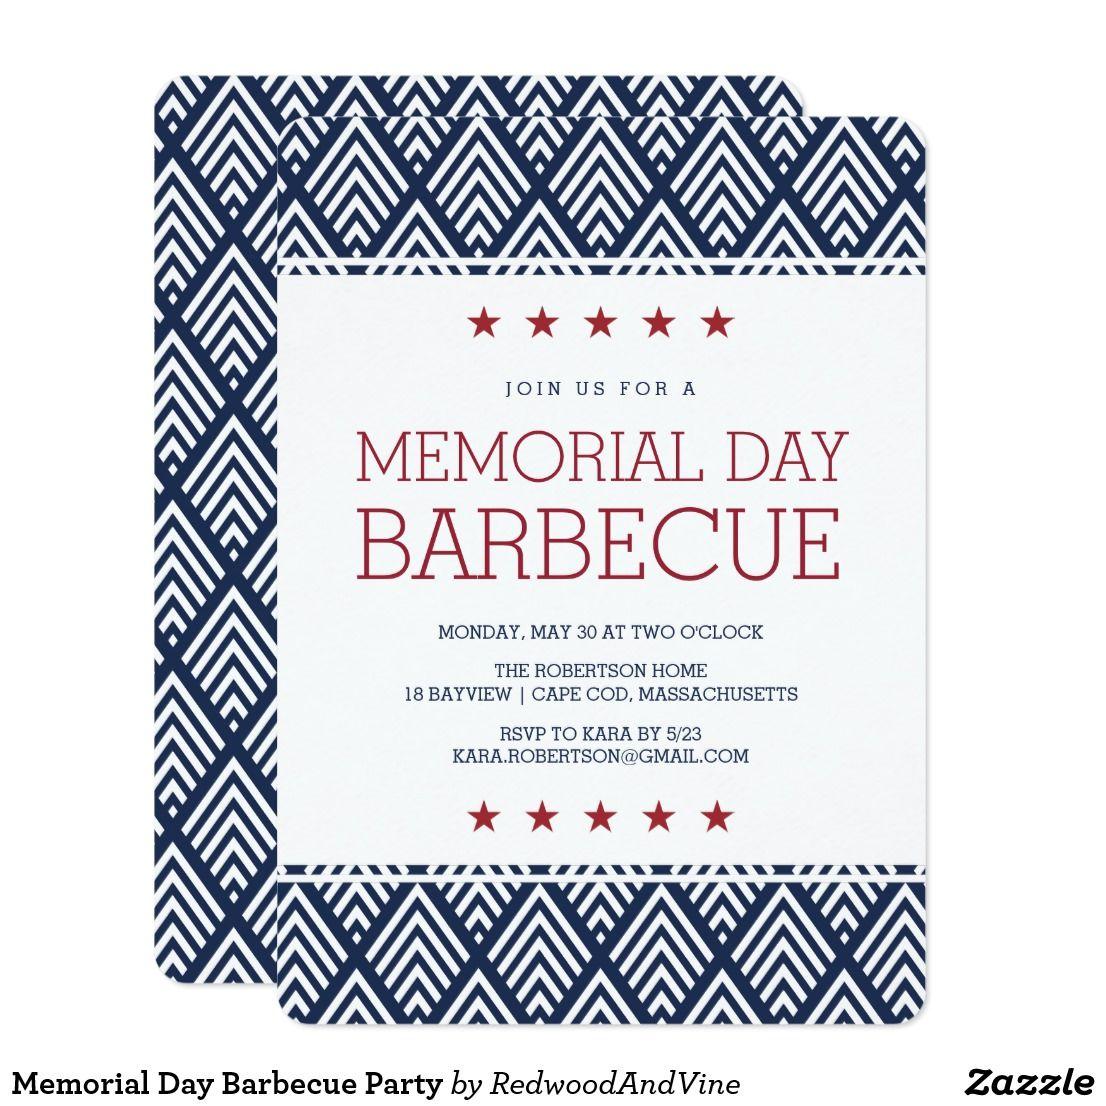 30 Unique And Breathtaking Wedding Backdrop Ideas: Memorial Day Barbecue Party Invitation